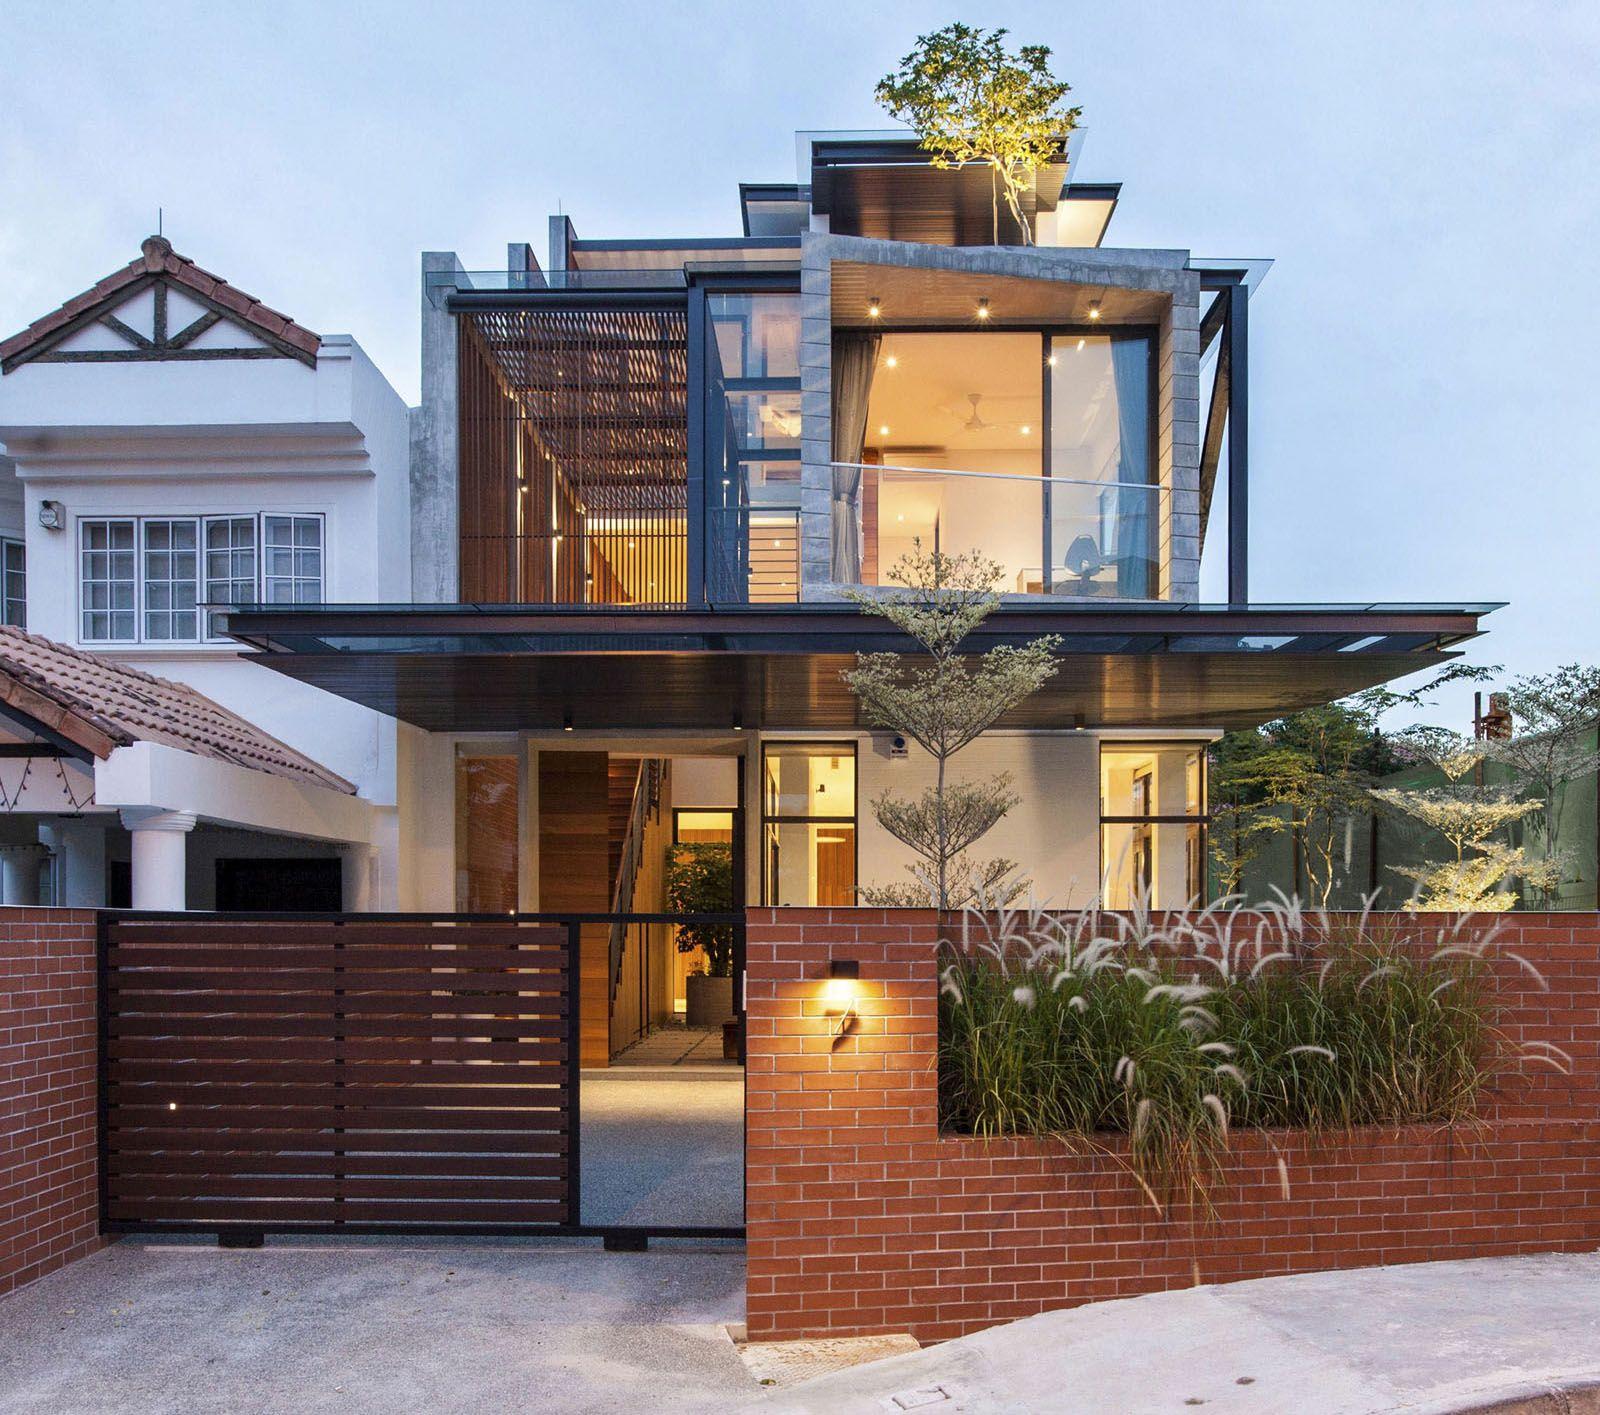 Home Design Singapore yacht house Landscape Design Modern Semi Detached House In Singapore